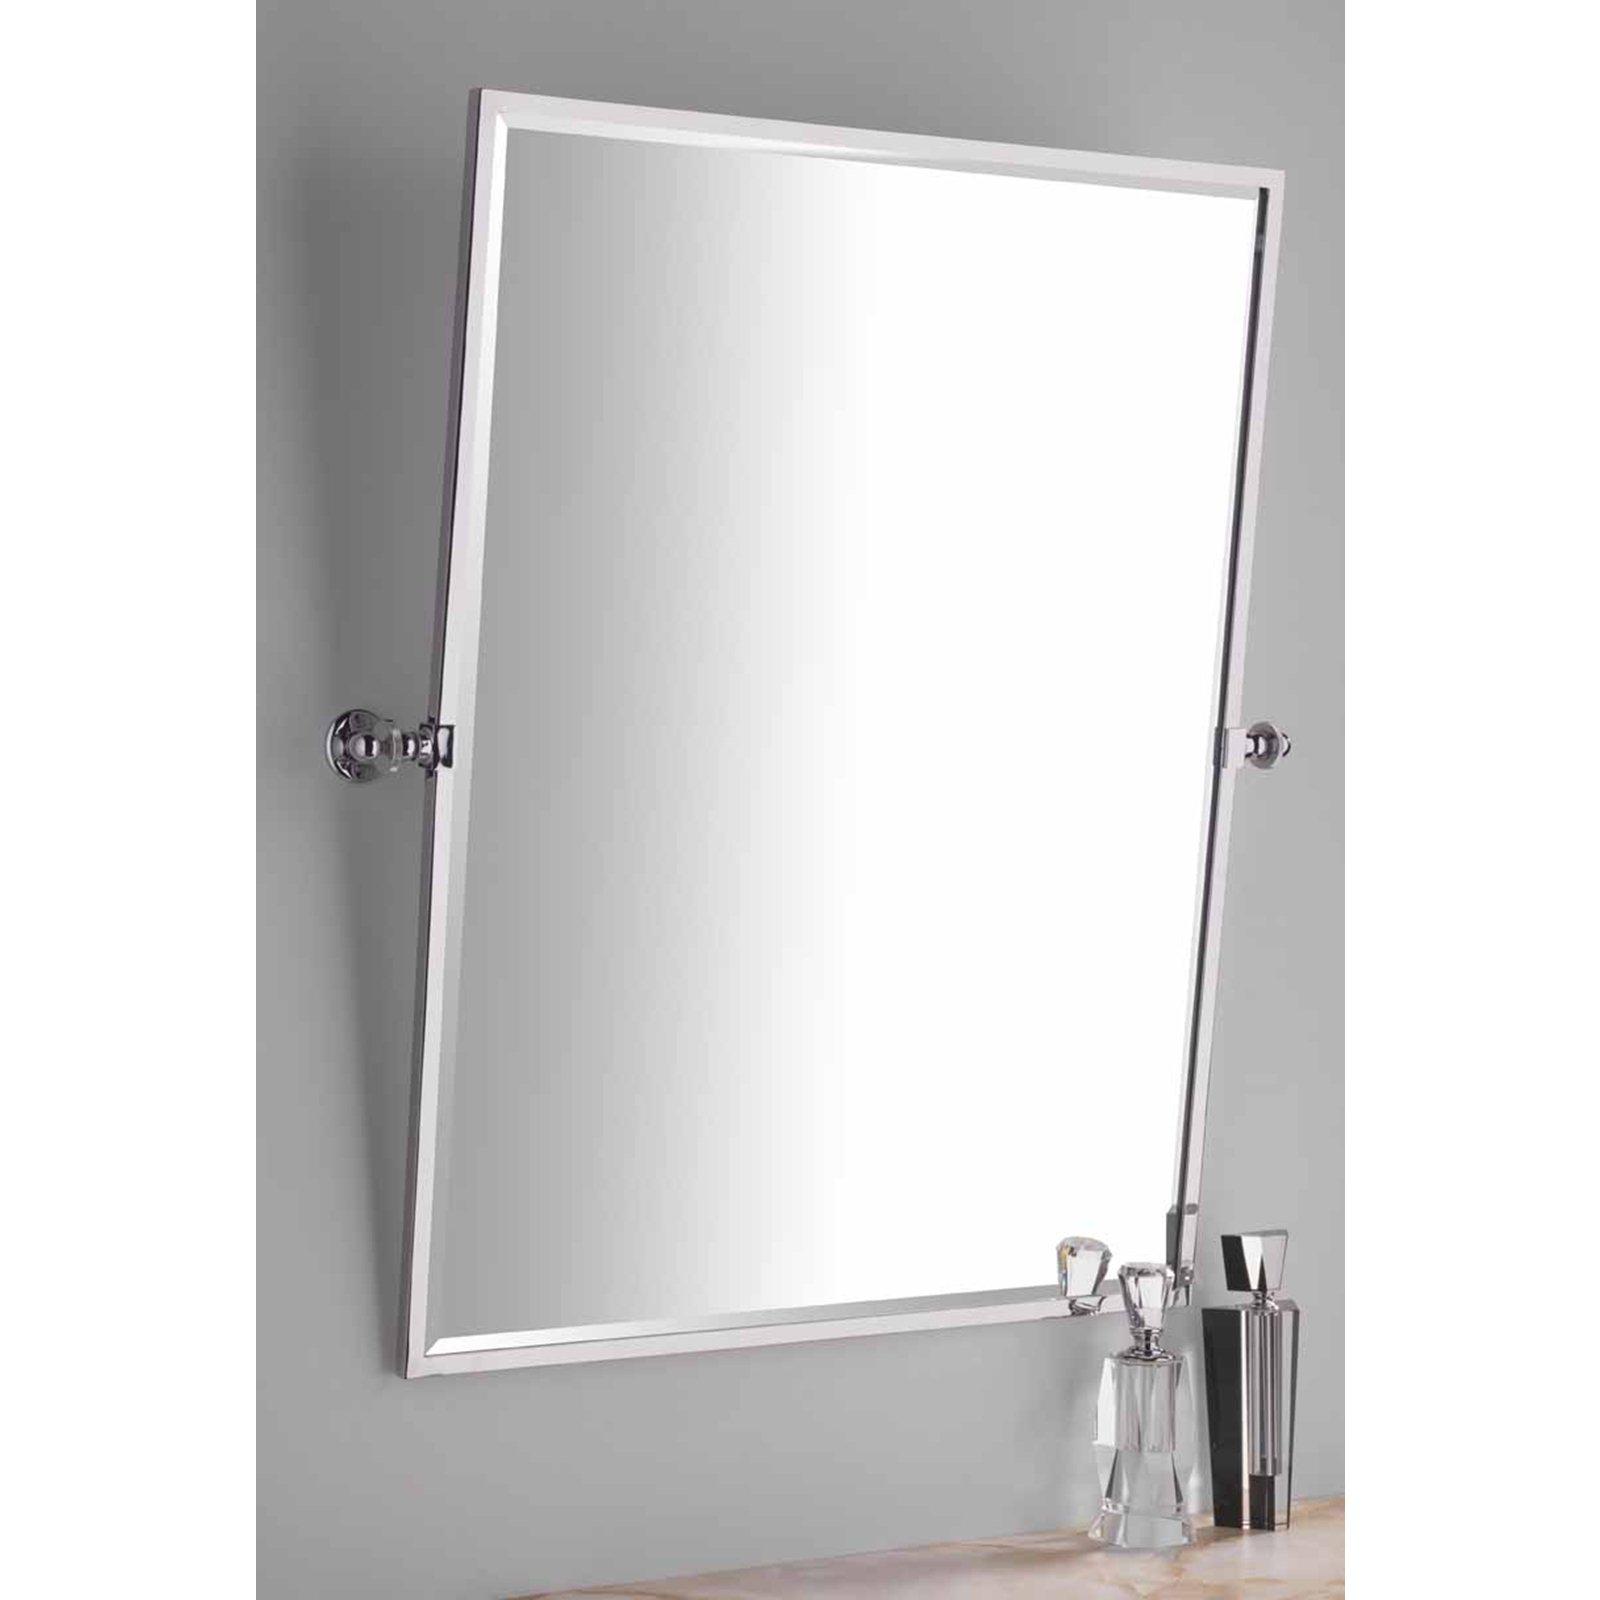 Large Swivel Bathroom Mirror